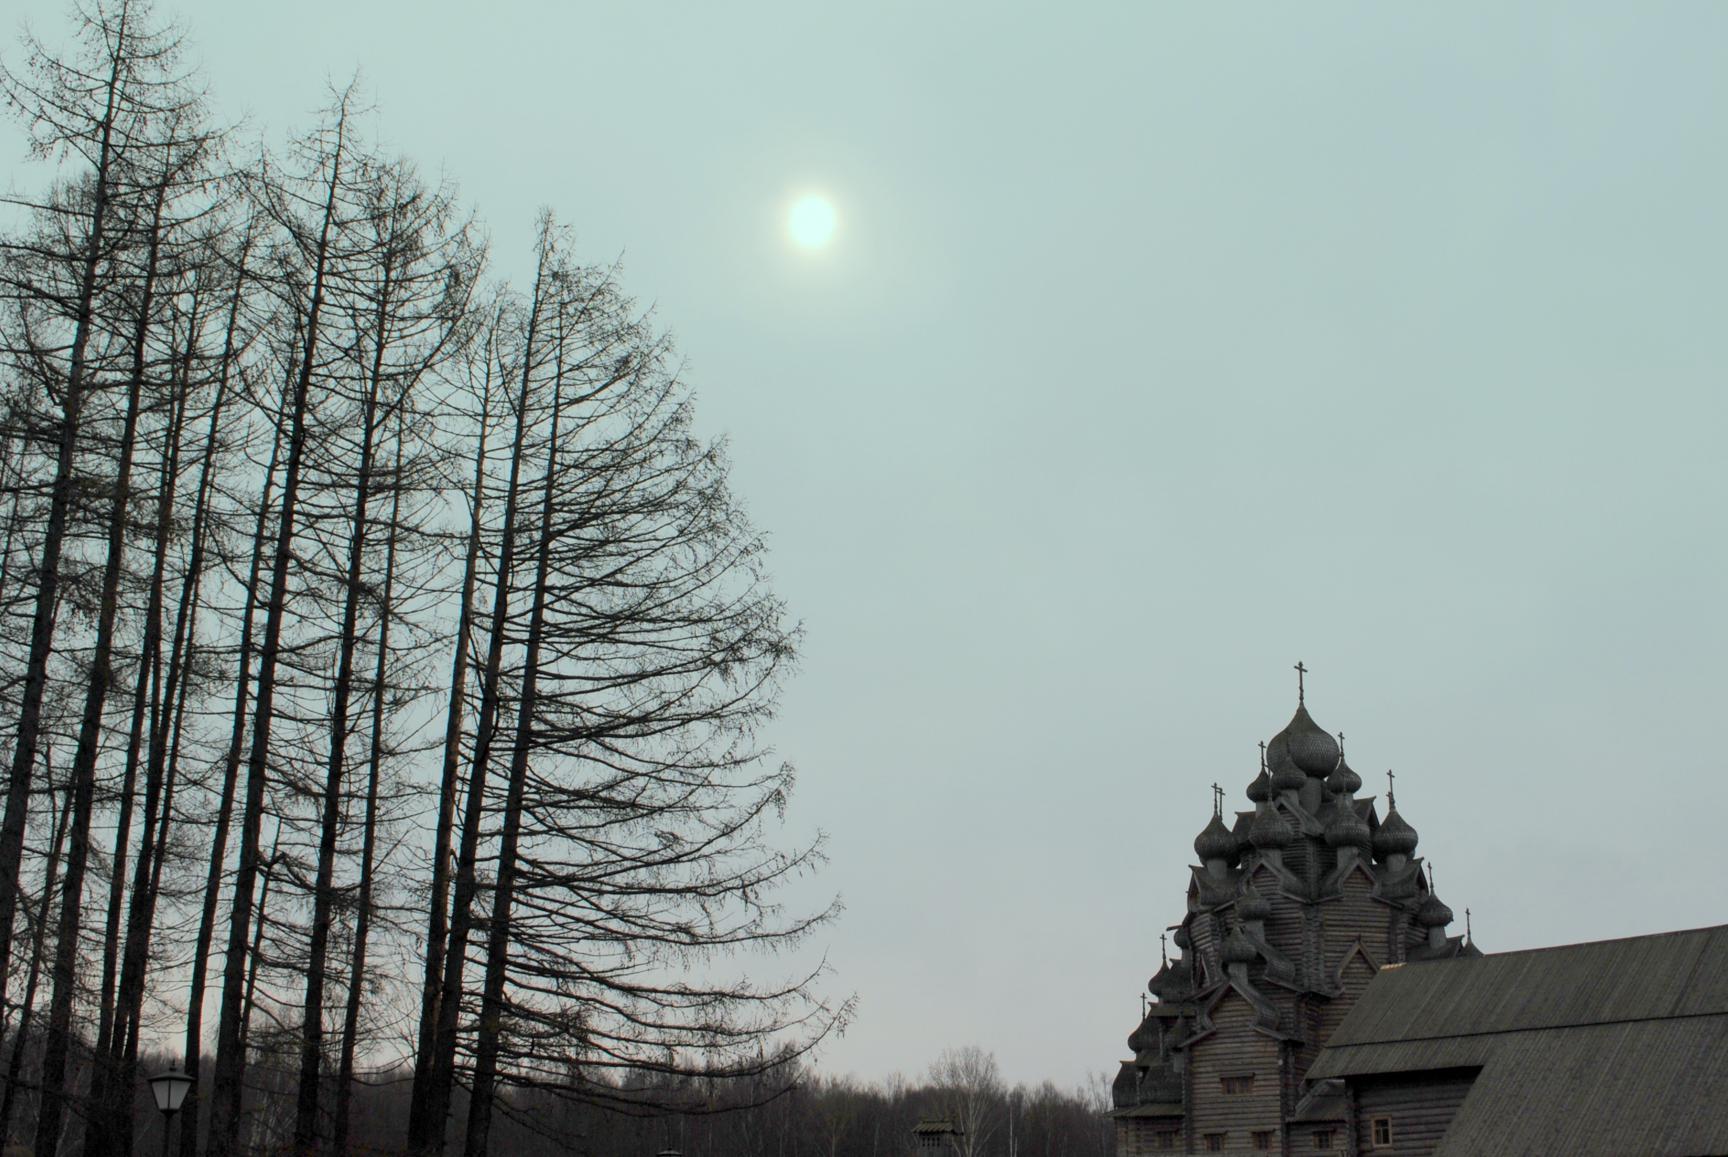 iglesia-transfiguración-san-petersburgo-1